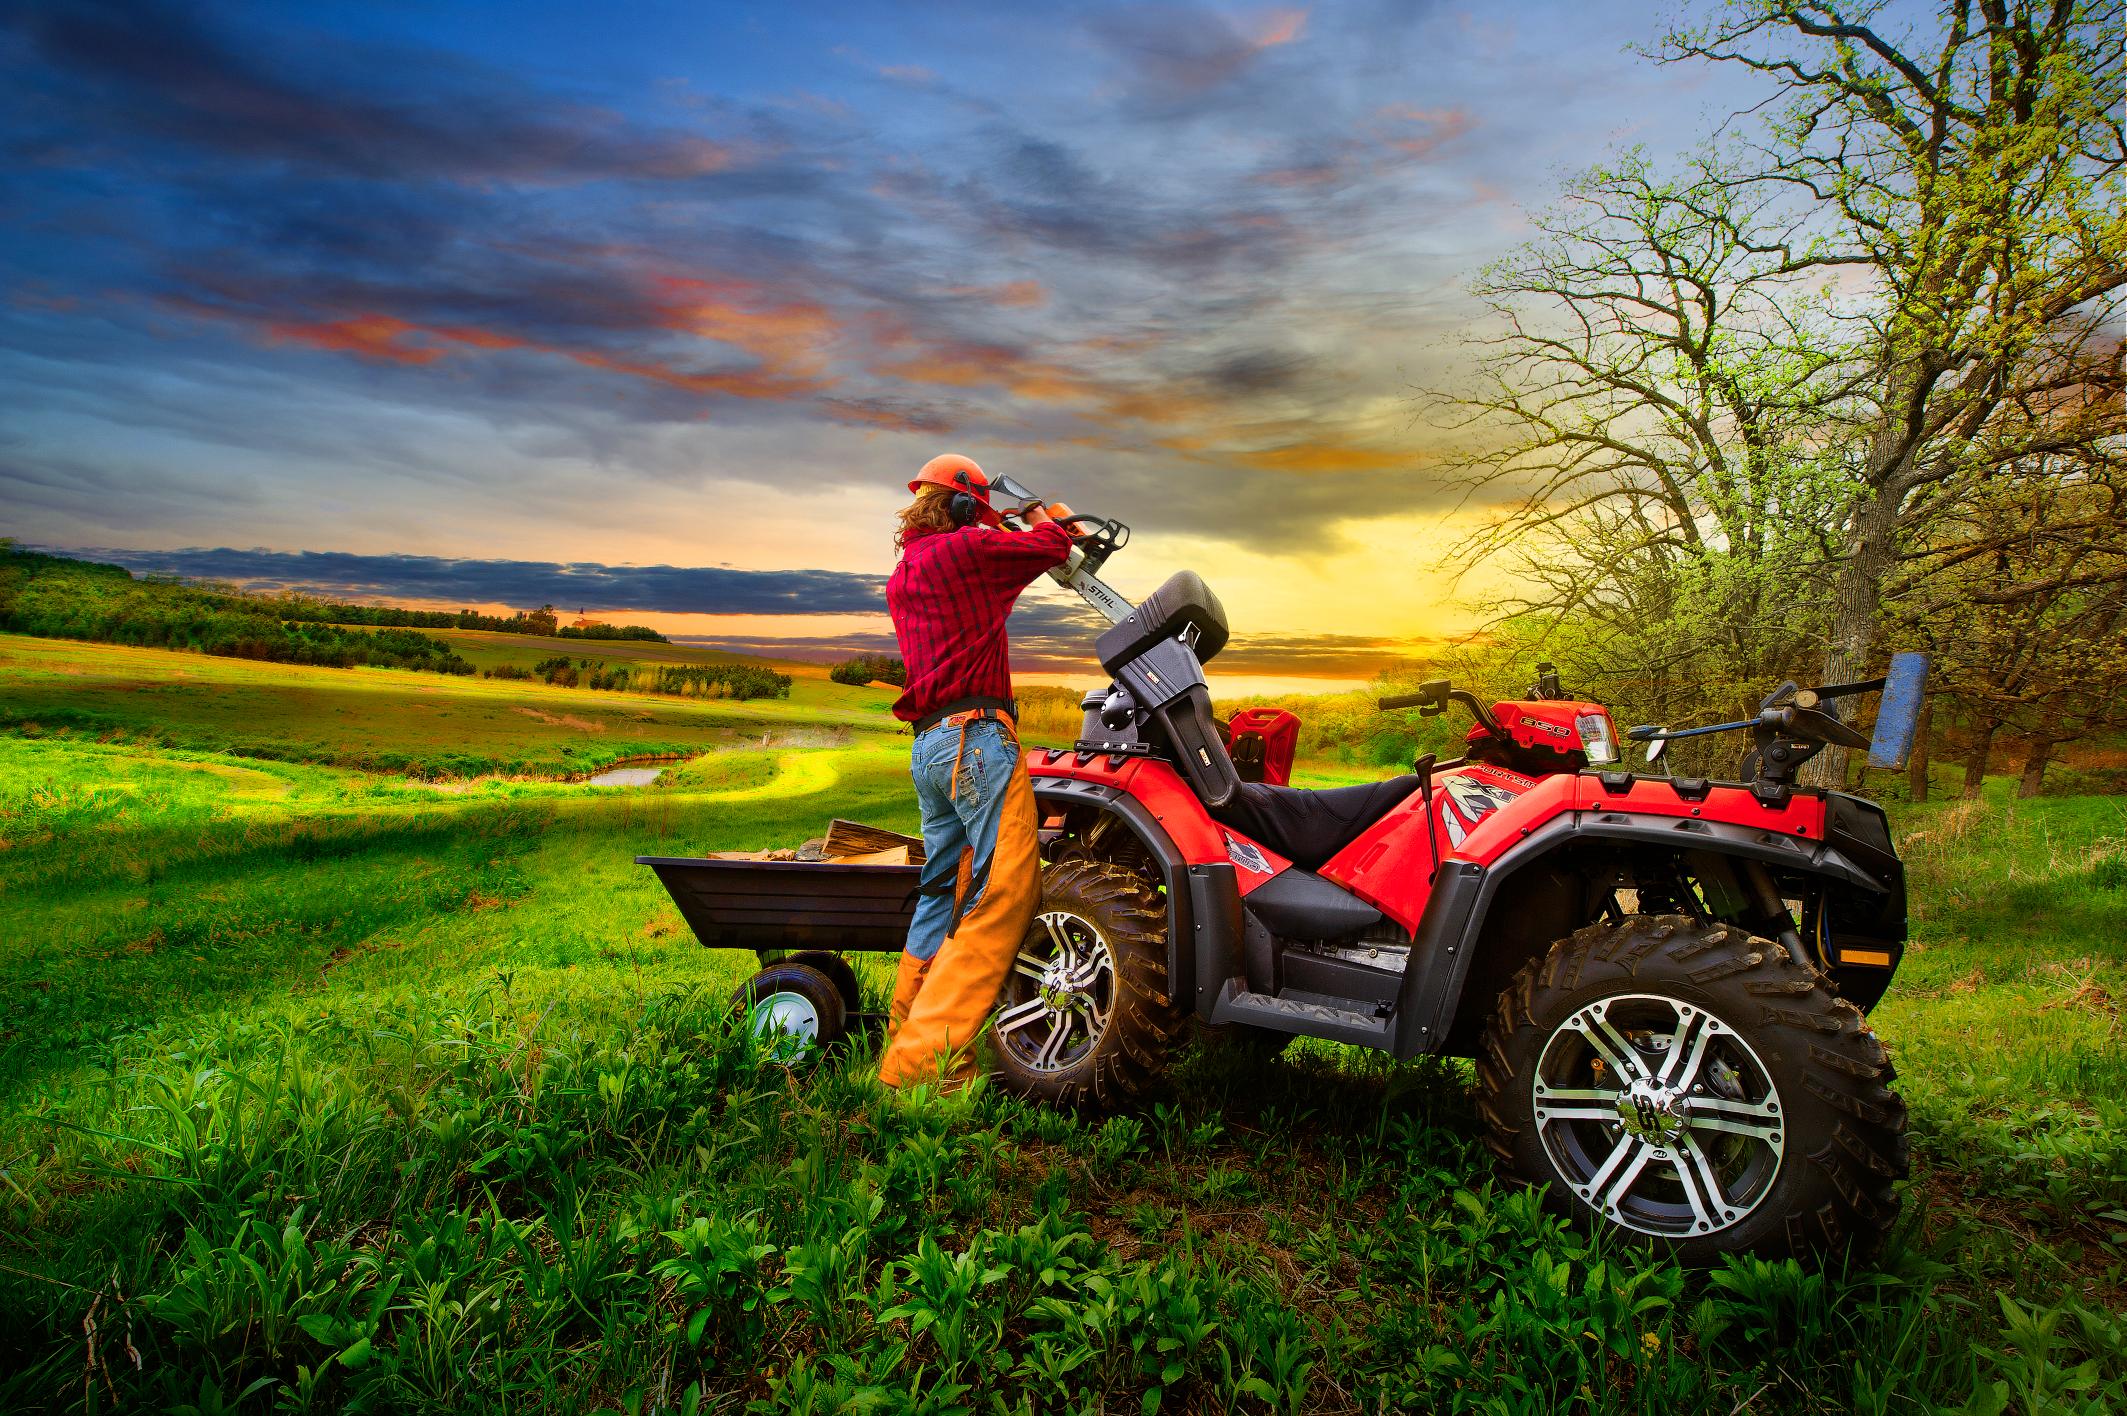 Adventure Travel - Top 5 ATV Brands & Equipment